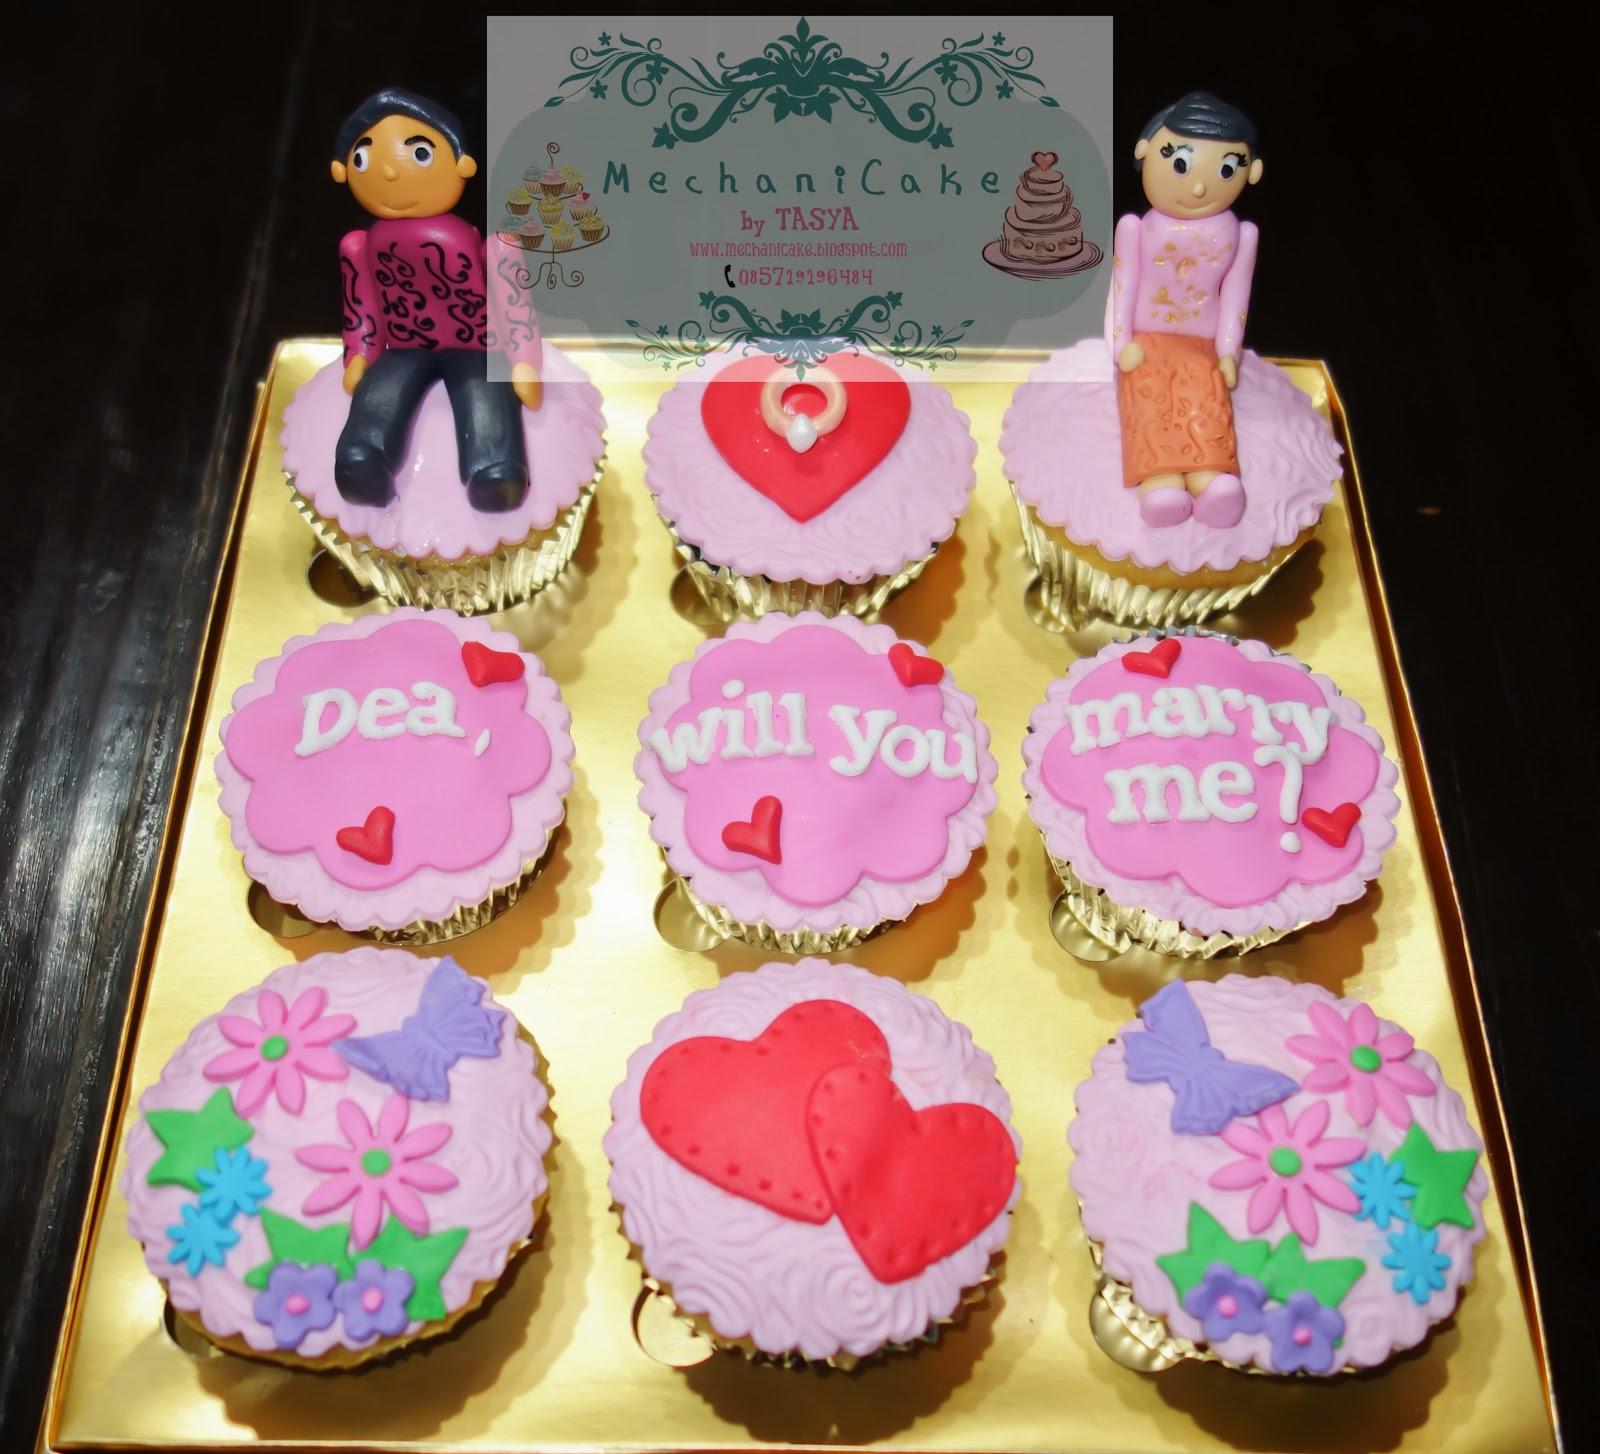 MechaniCake: Lamaran & Angsul-angsul cupcake for Dea-Adam